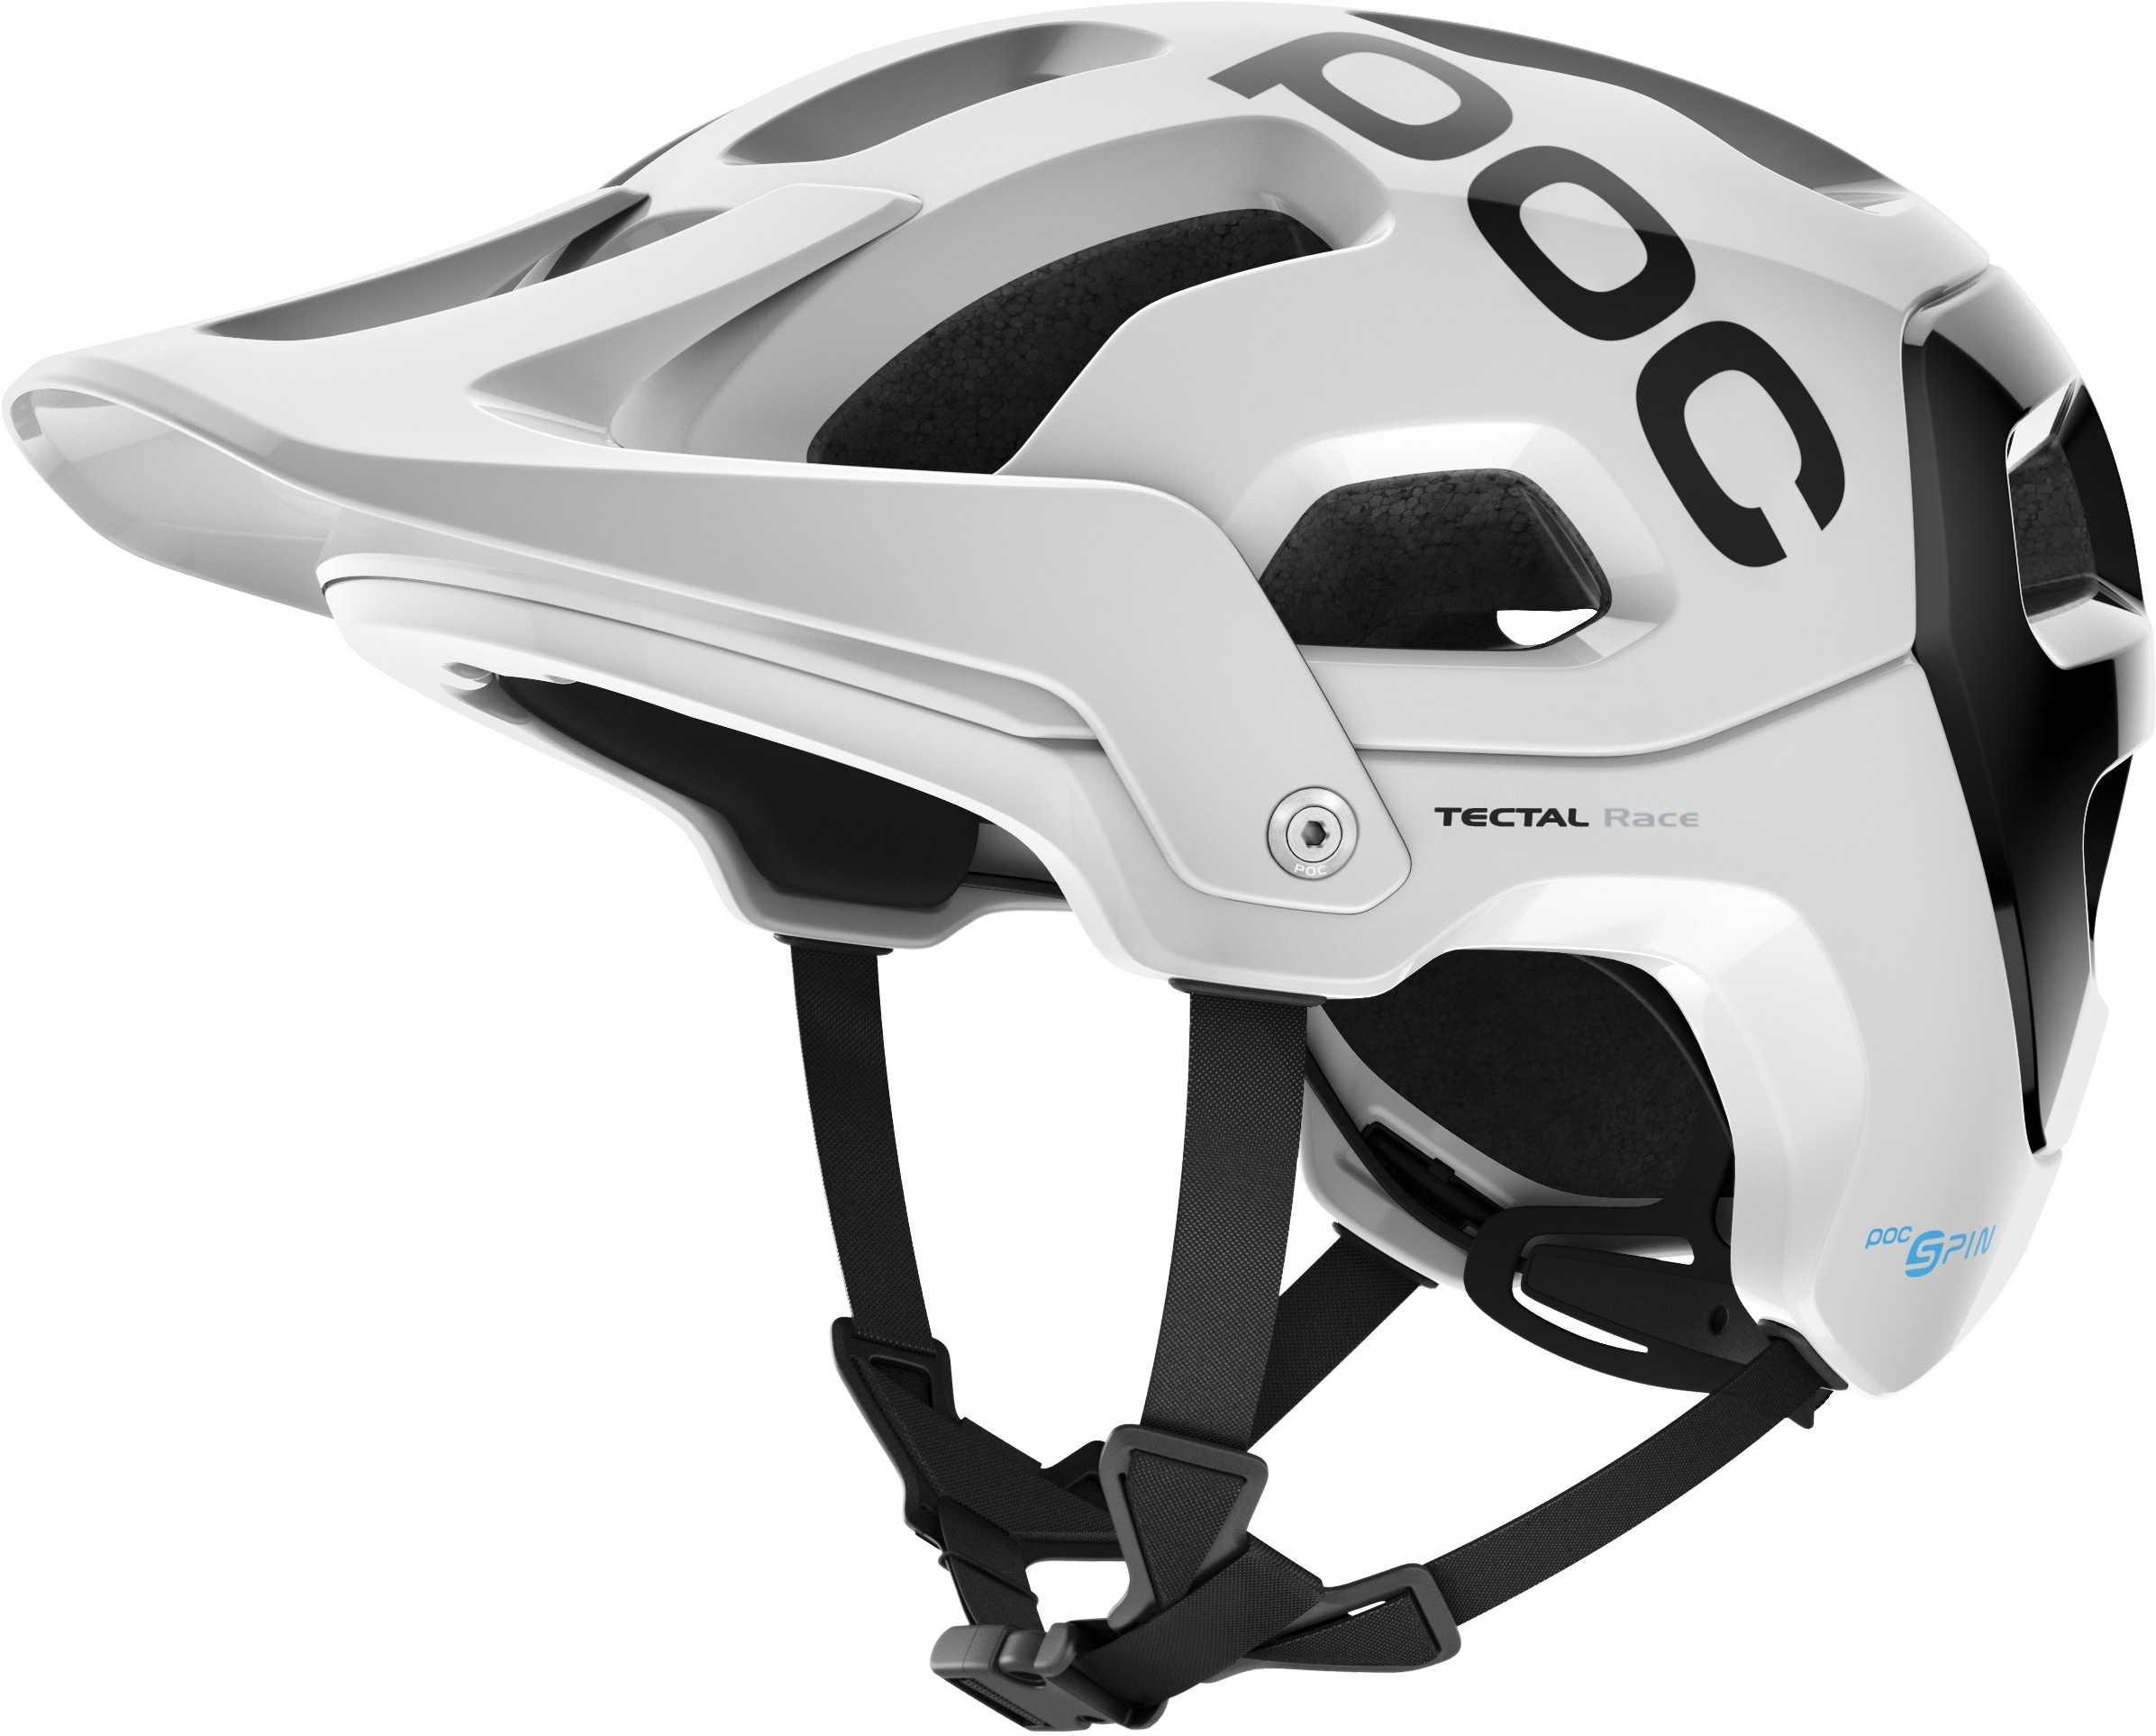 POC cykelhjälmar du kan köpa online  5a671b20ef1f1